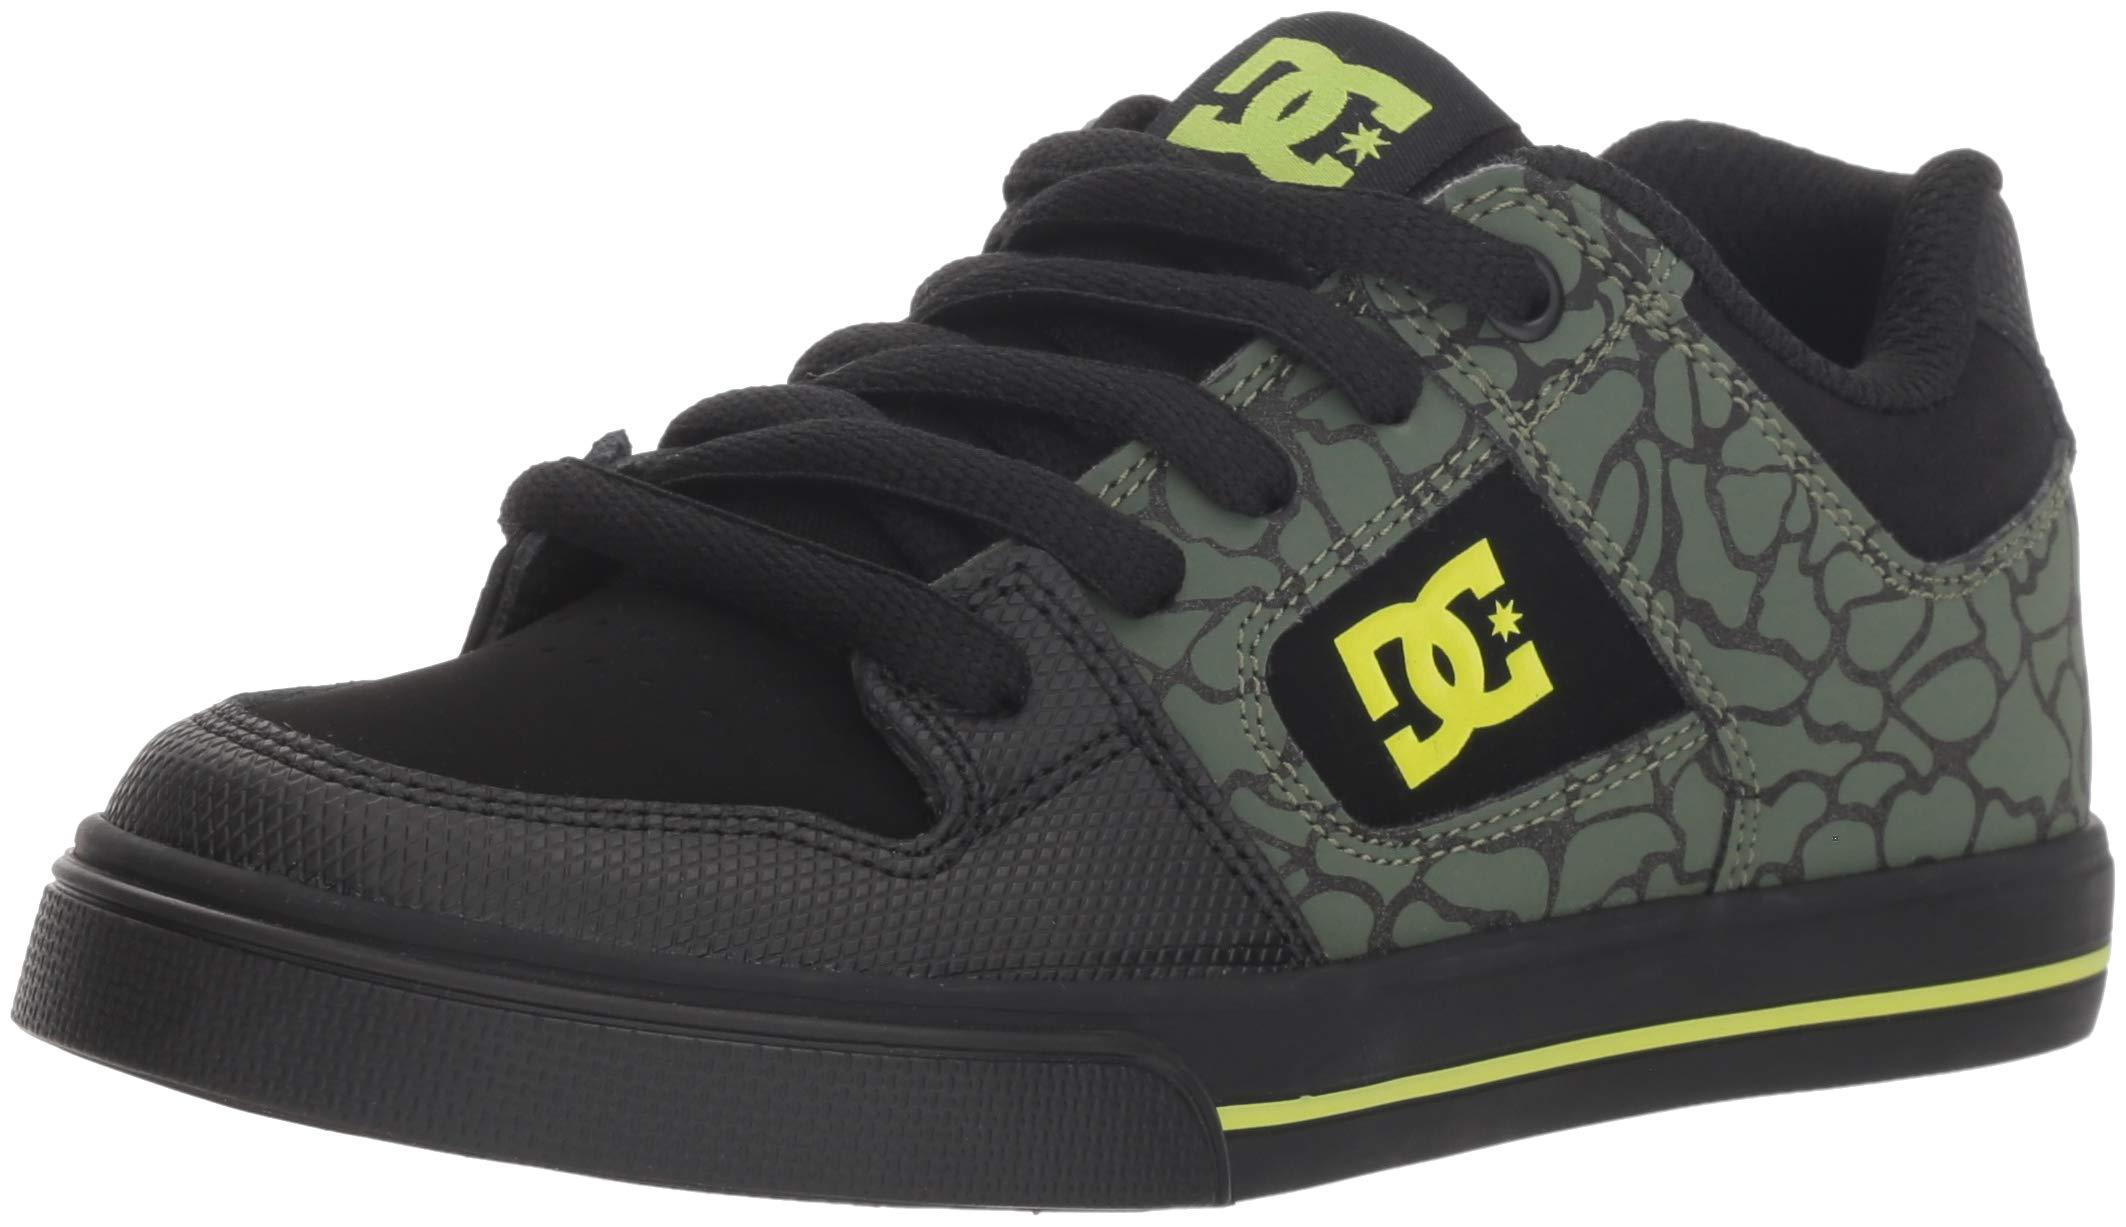 DC Boys' Pure SE Skate Shoe, Black/Soft Lime, 11 M US Little Kid